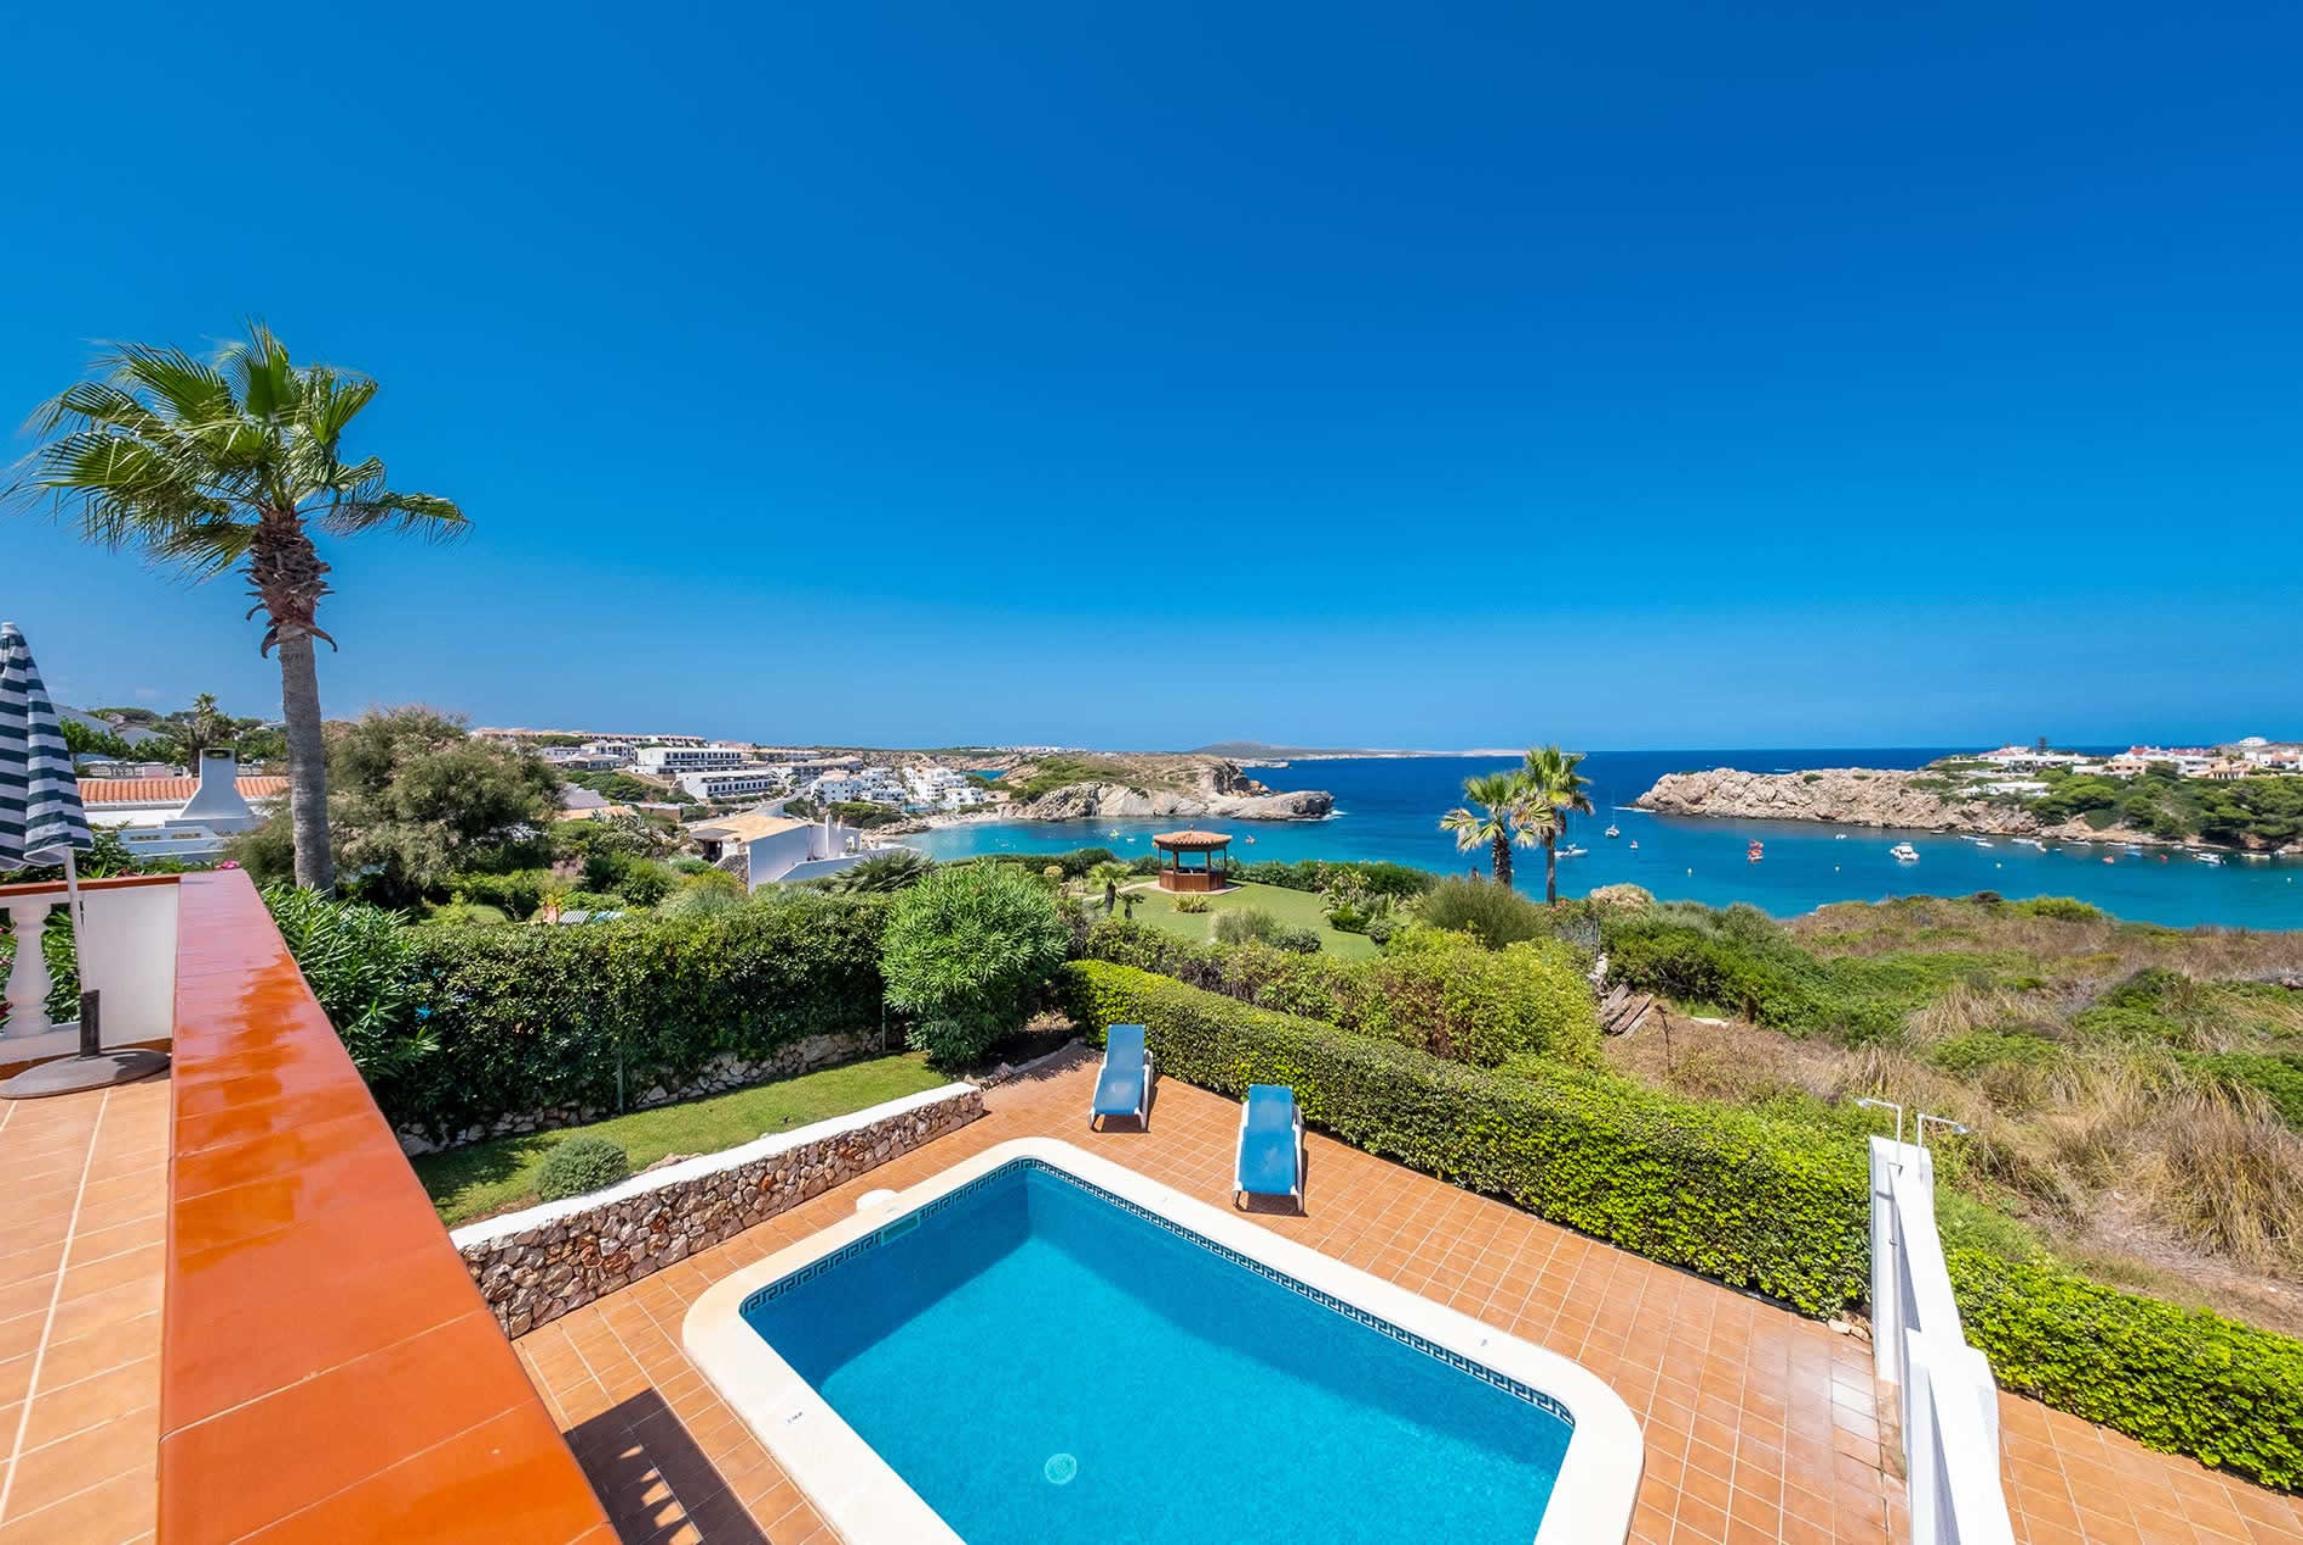 Ferienhaus Bellavista I (2654269), Arenal De'N Castell, Menorca, Balearische Inseln, Spanien, Bild 18